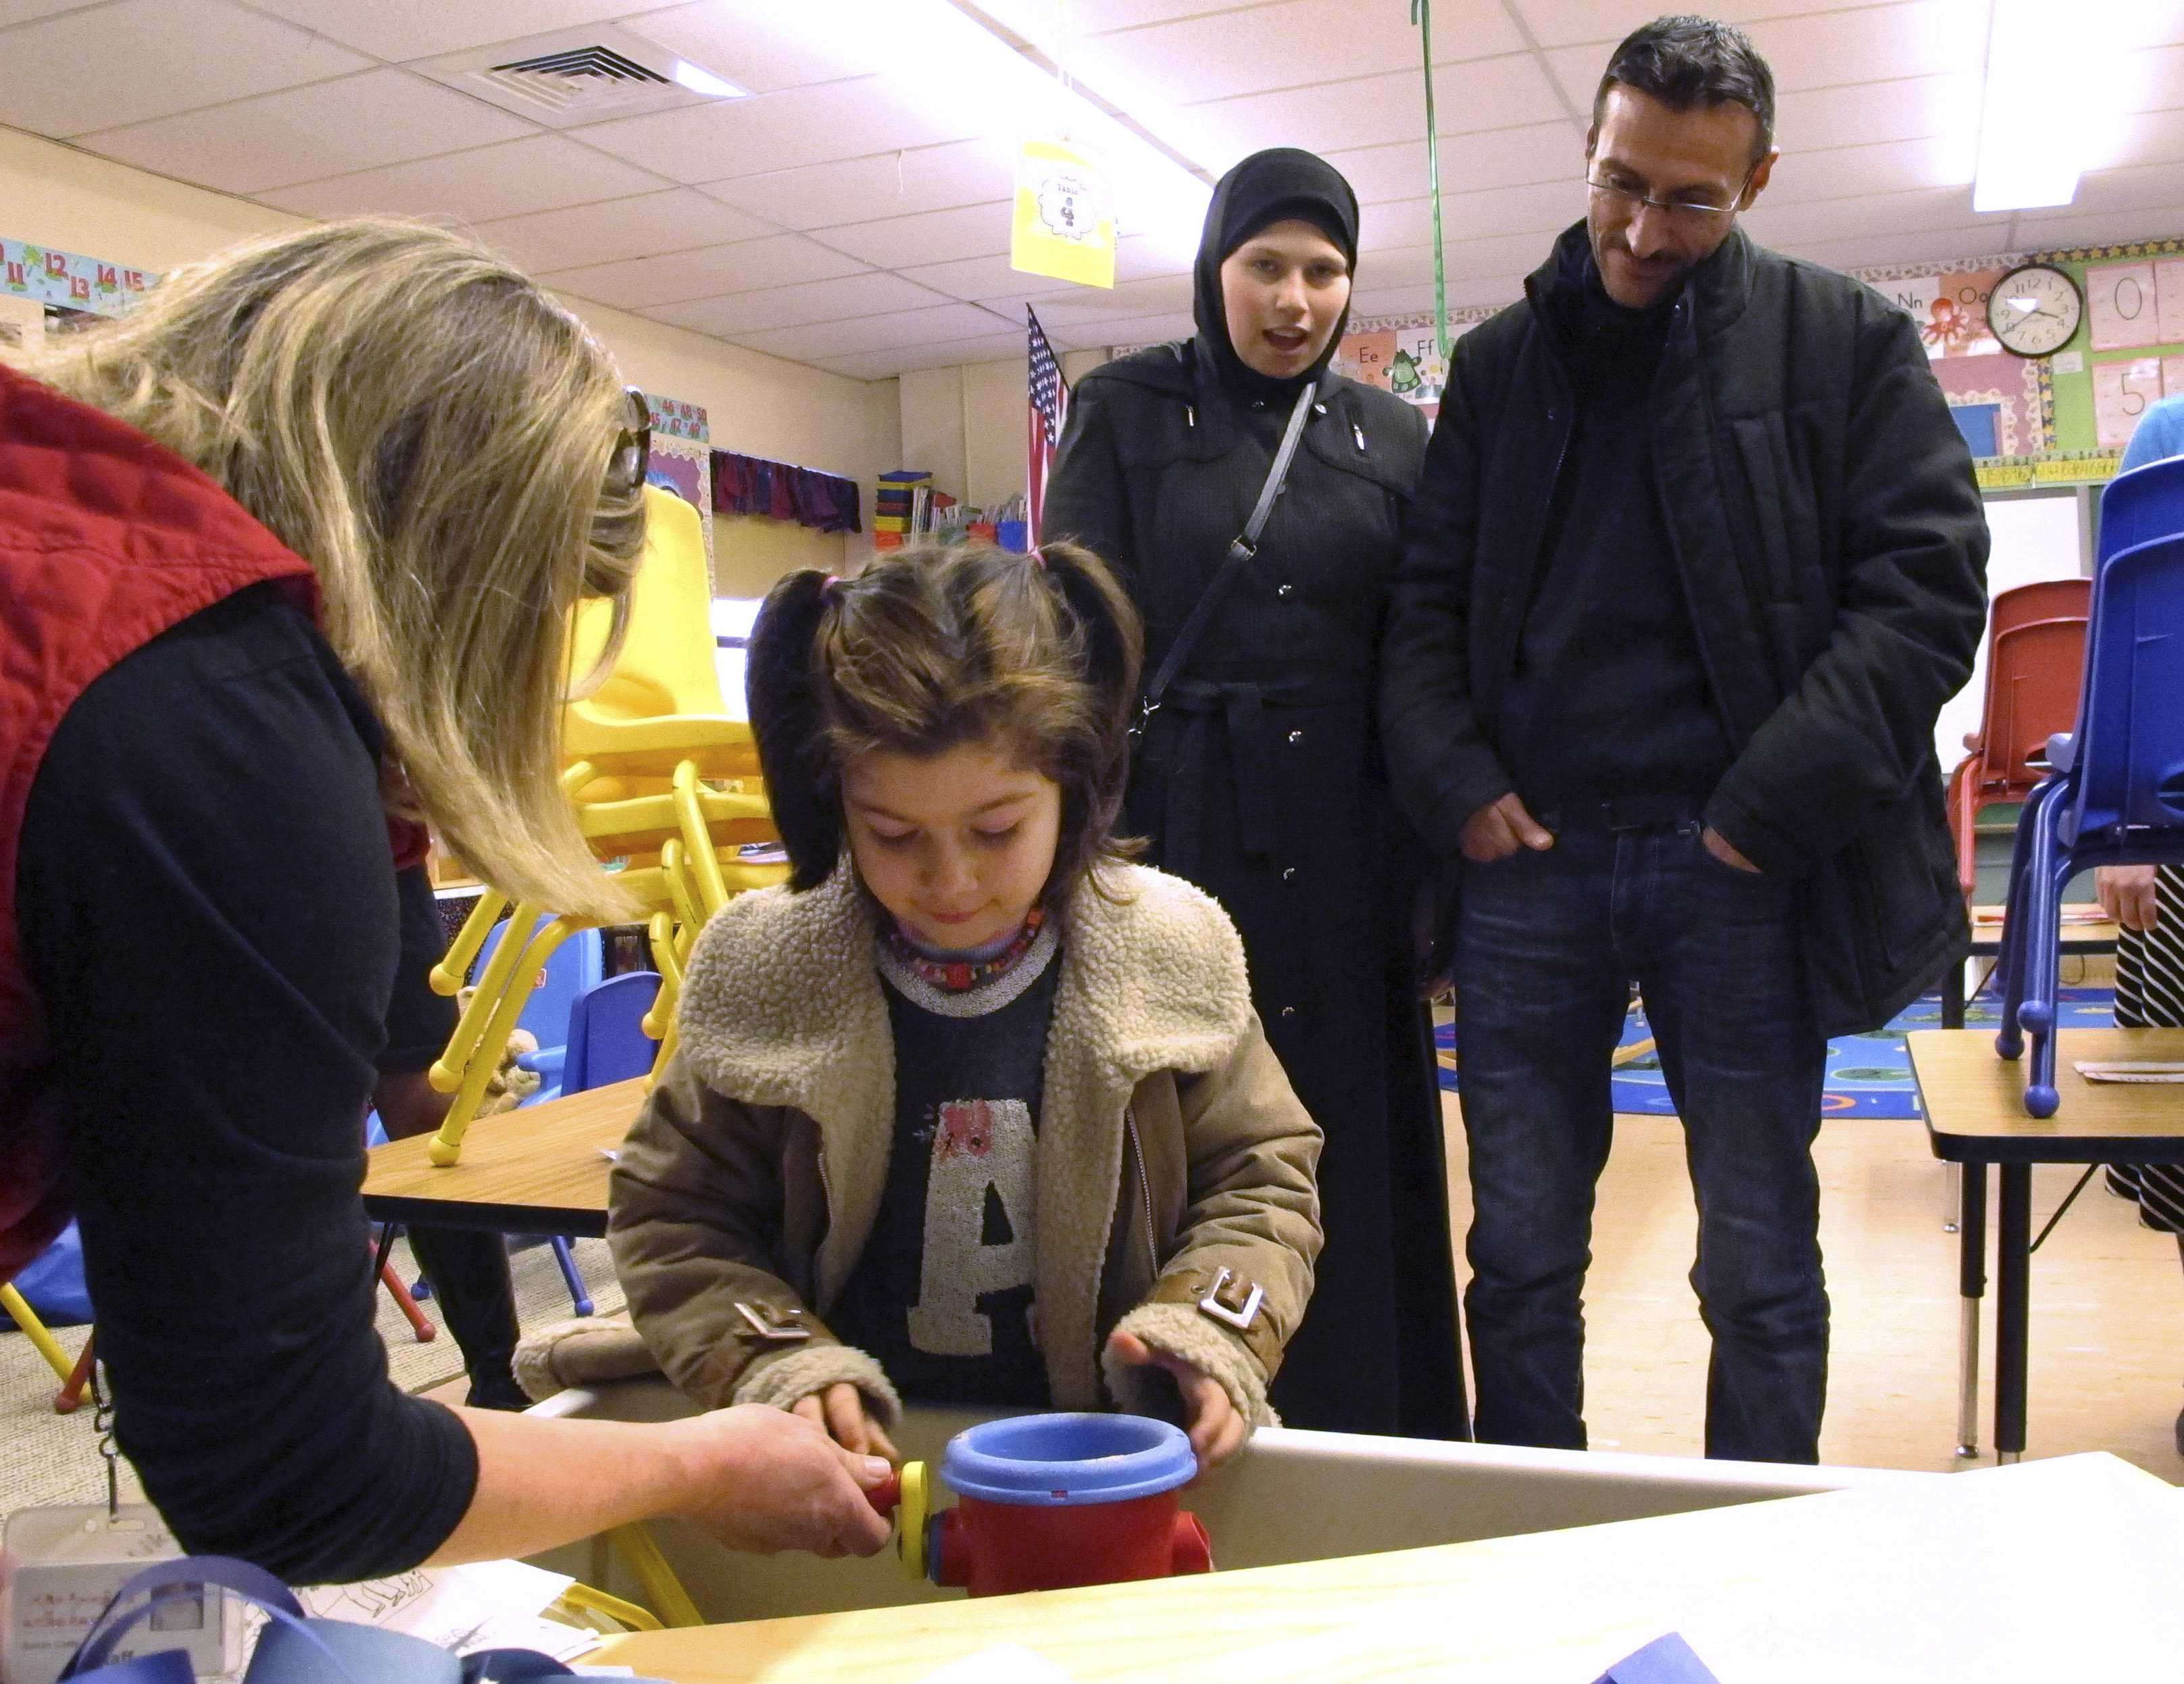 Kindergarten teacher Susan Cody shows newly arrived Syrian refugee Dania Khatib, 5, around a classroom